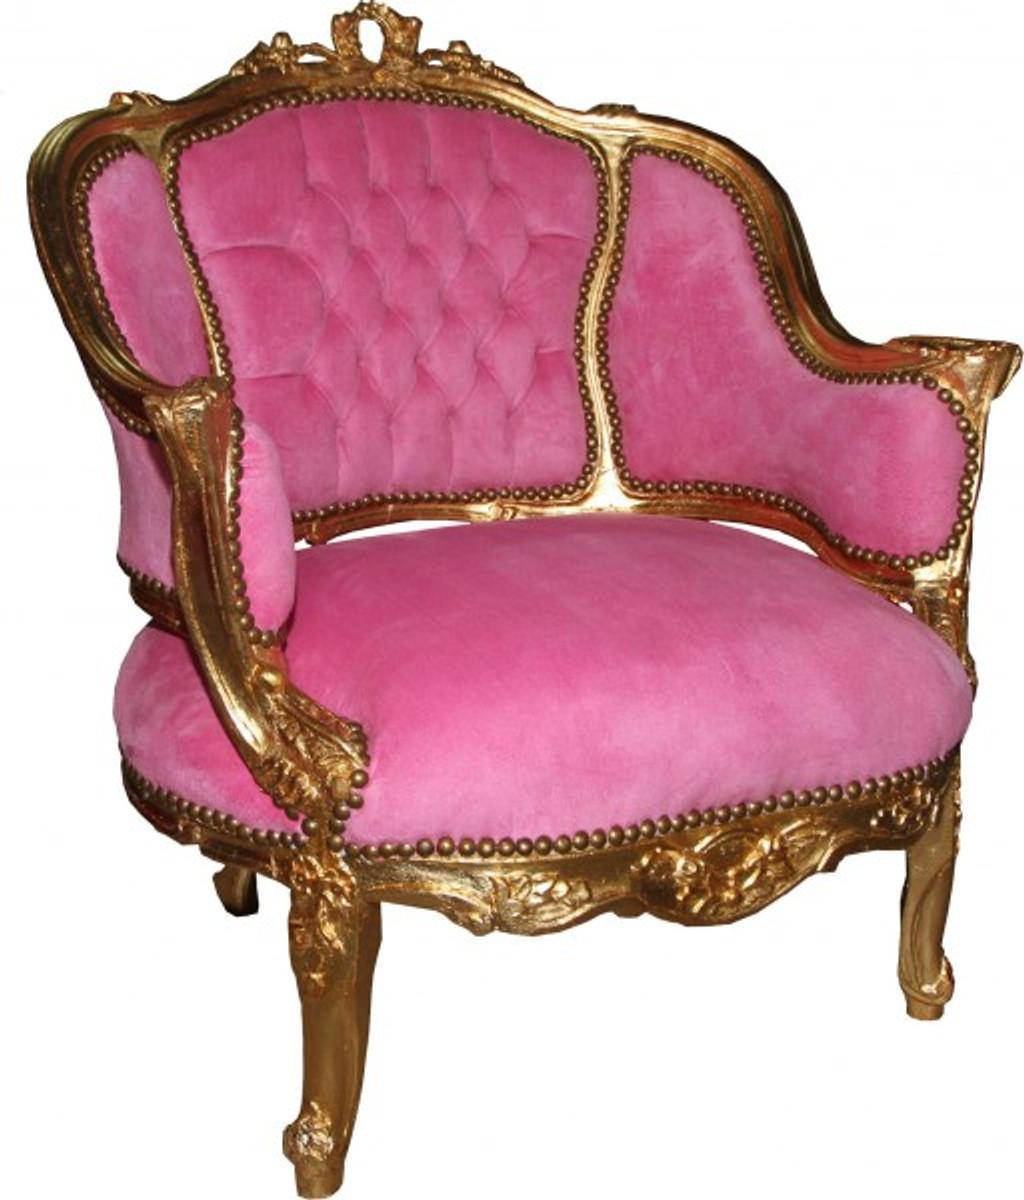 Casa Padrino Baroque Salon Lounge Chair Rose Gold Cocktail